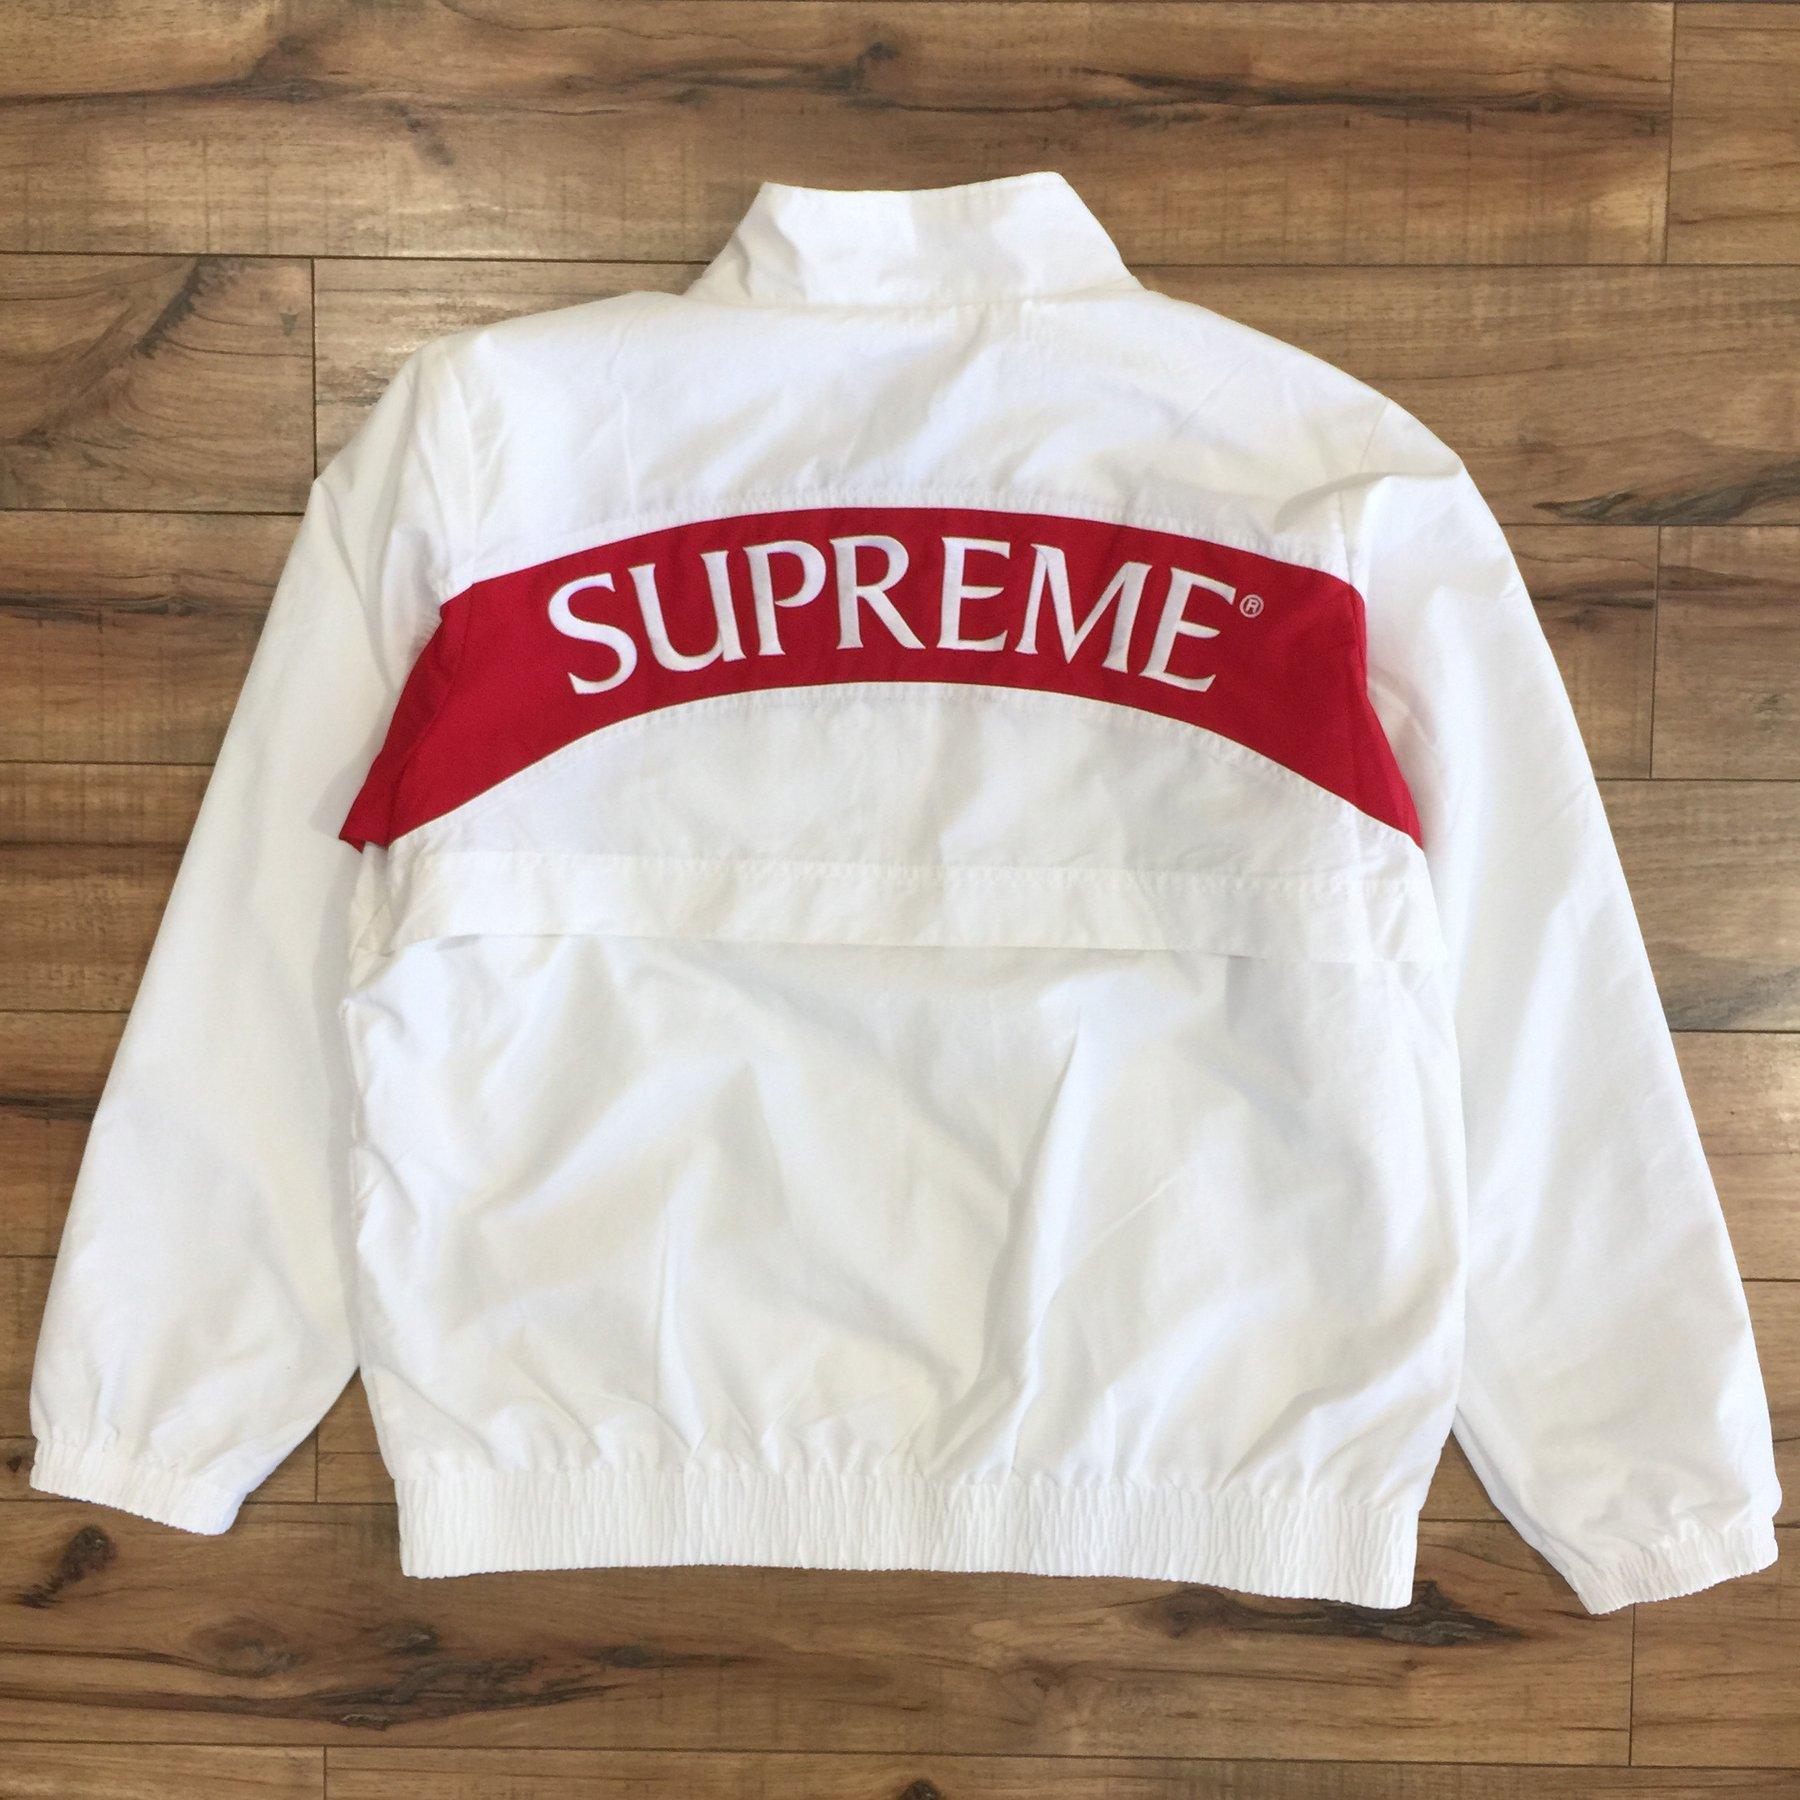 5dfd0be2c824 Supreme Supreme Arc Jacket Fw17